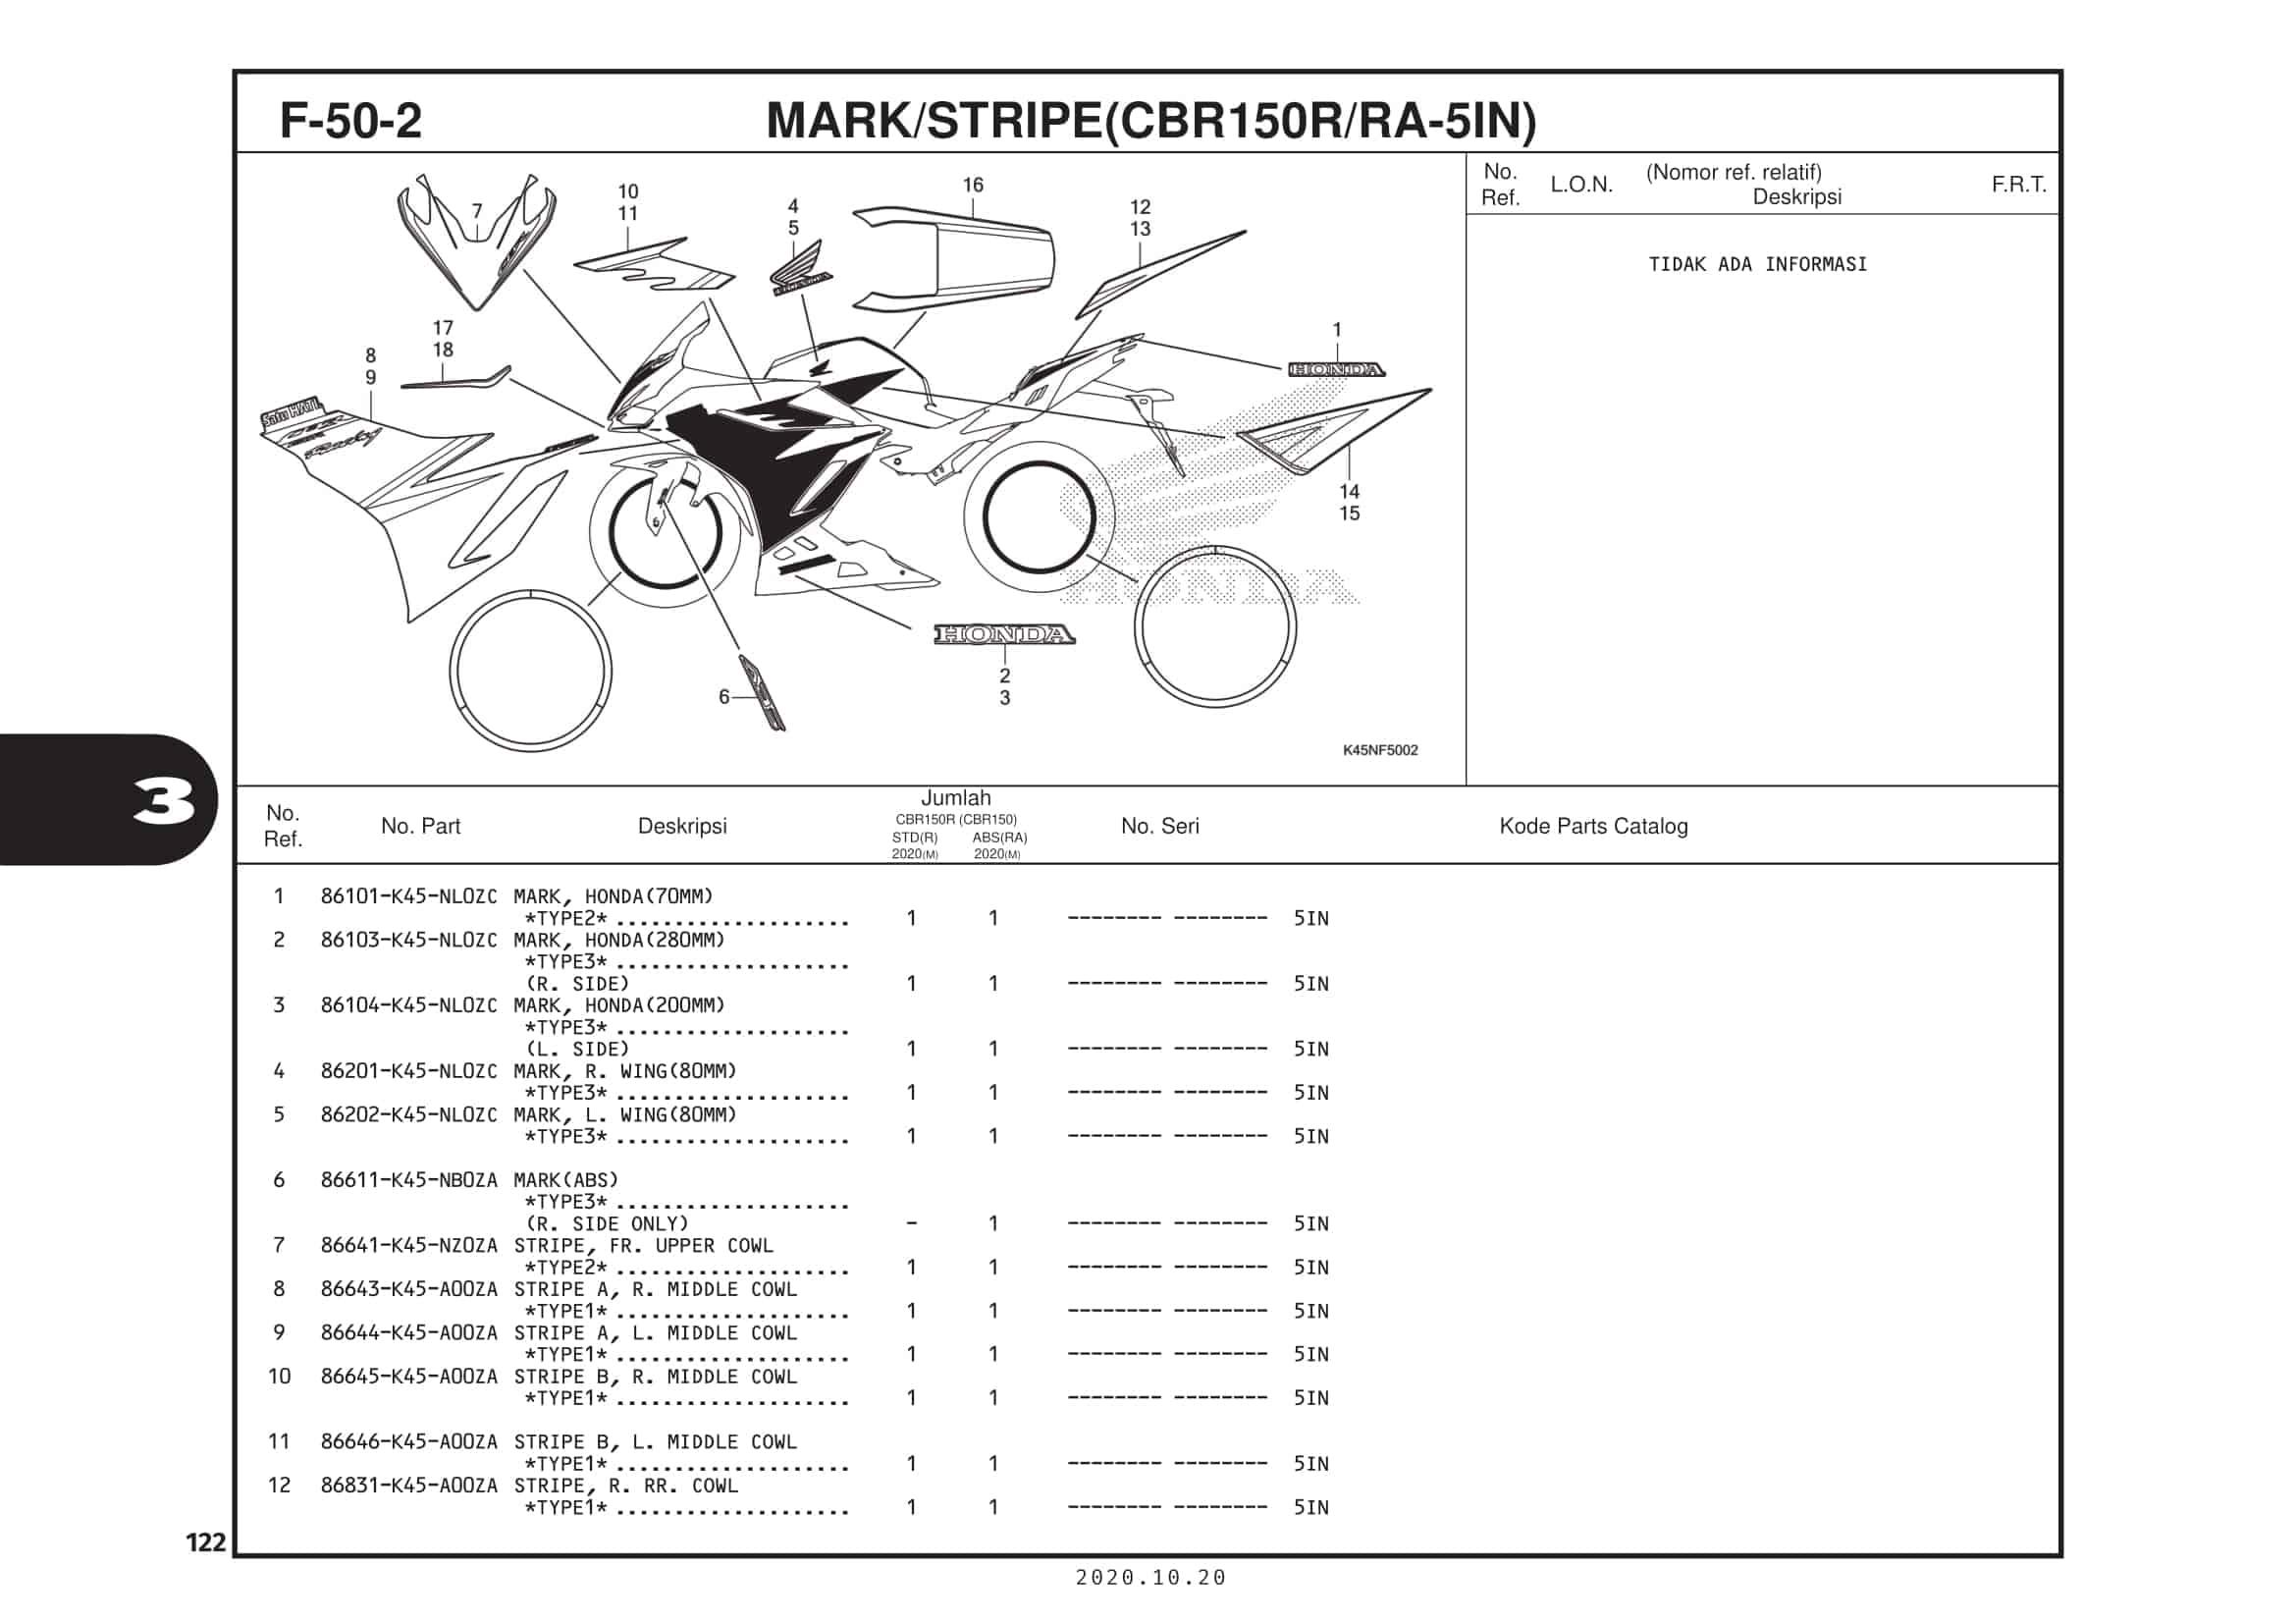 F-50-2 Mark Stripe (CBR150R/RA-5IN)